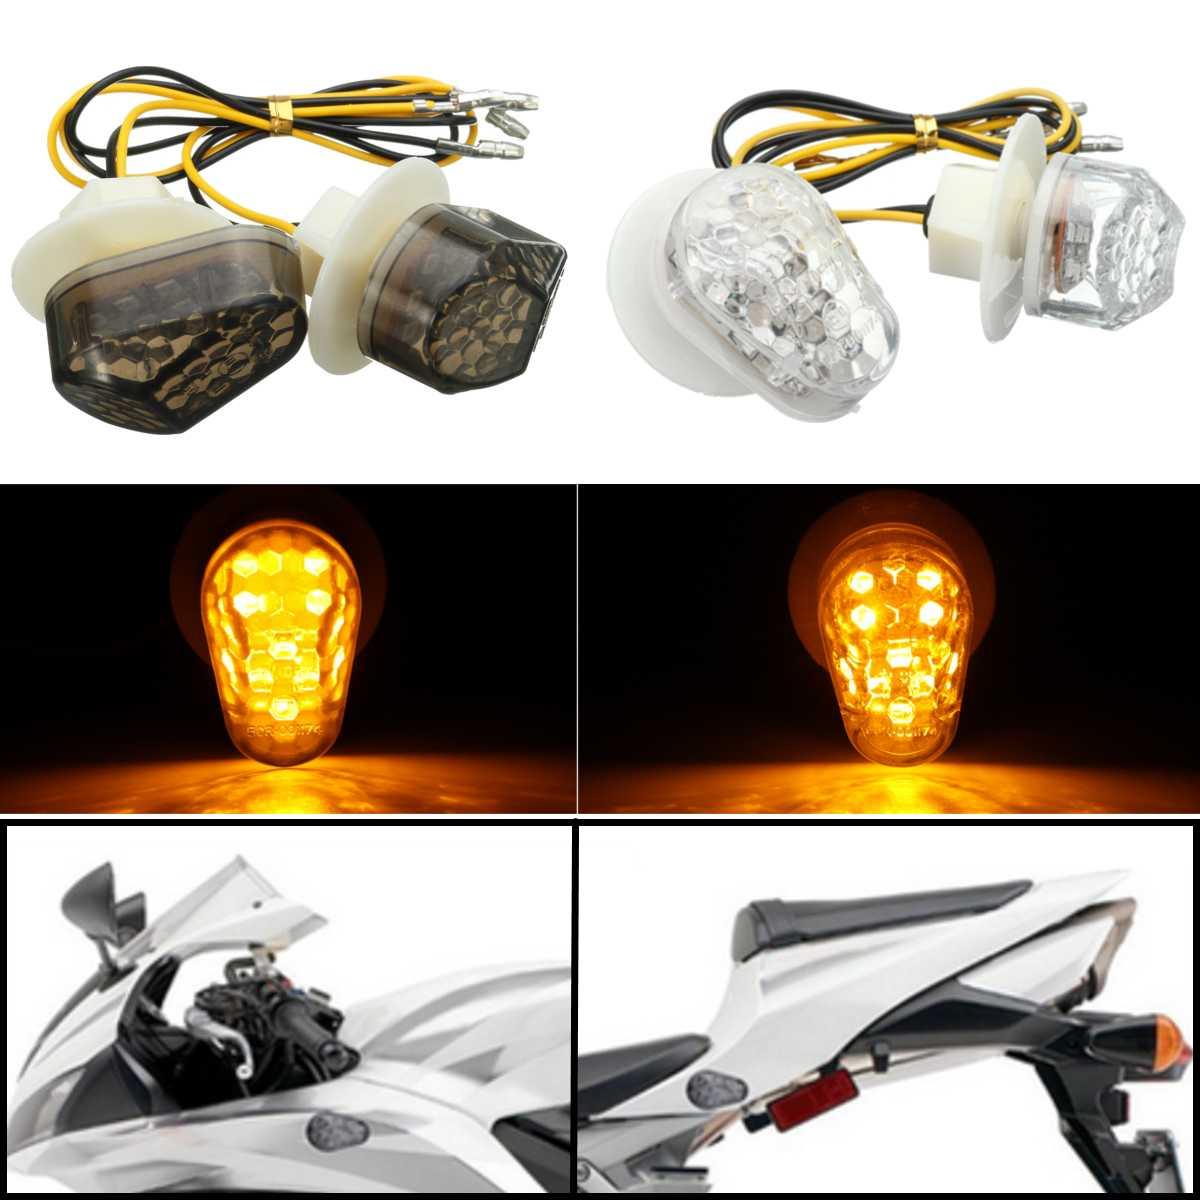 Motorcycle LED Flush Mount Turn Signal Light Indicator Blinker Lamp For Yamaha FZ6R FZ1 YZF R1 R6 R6S FZ09